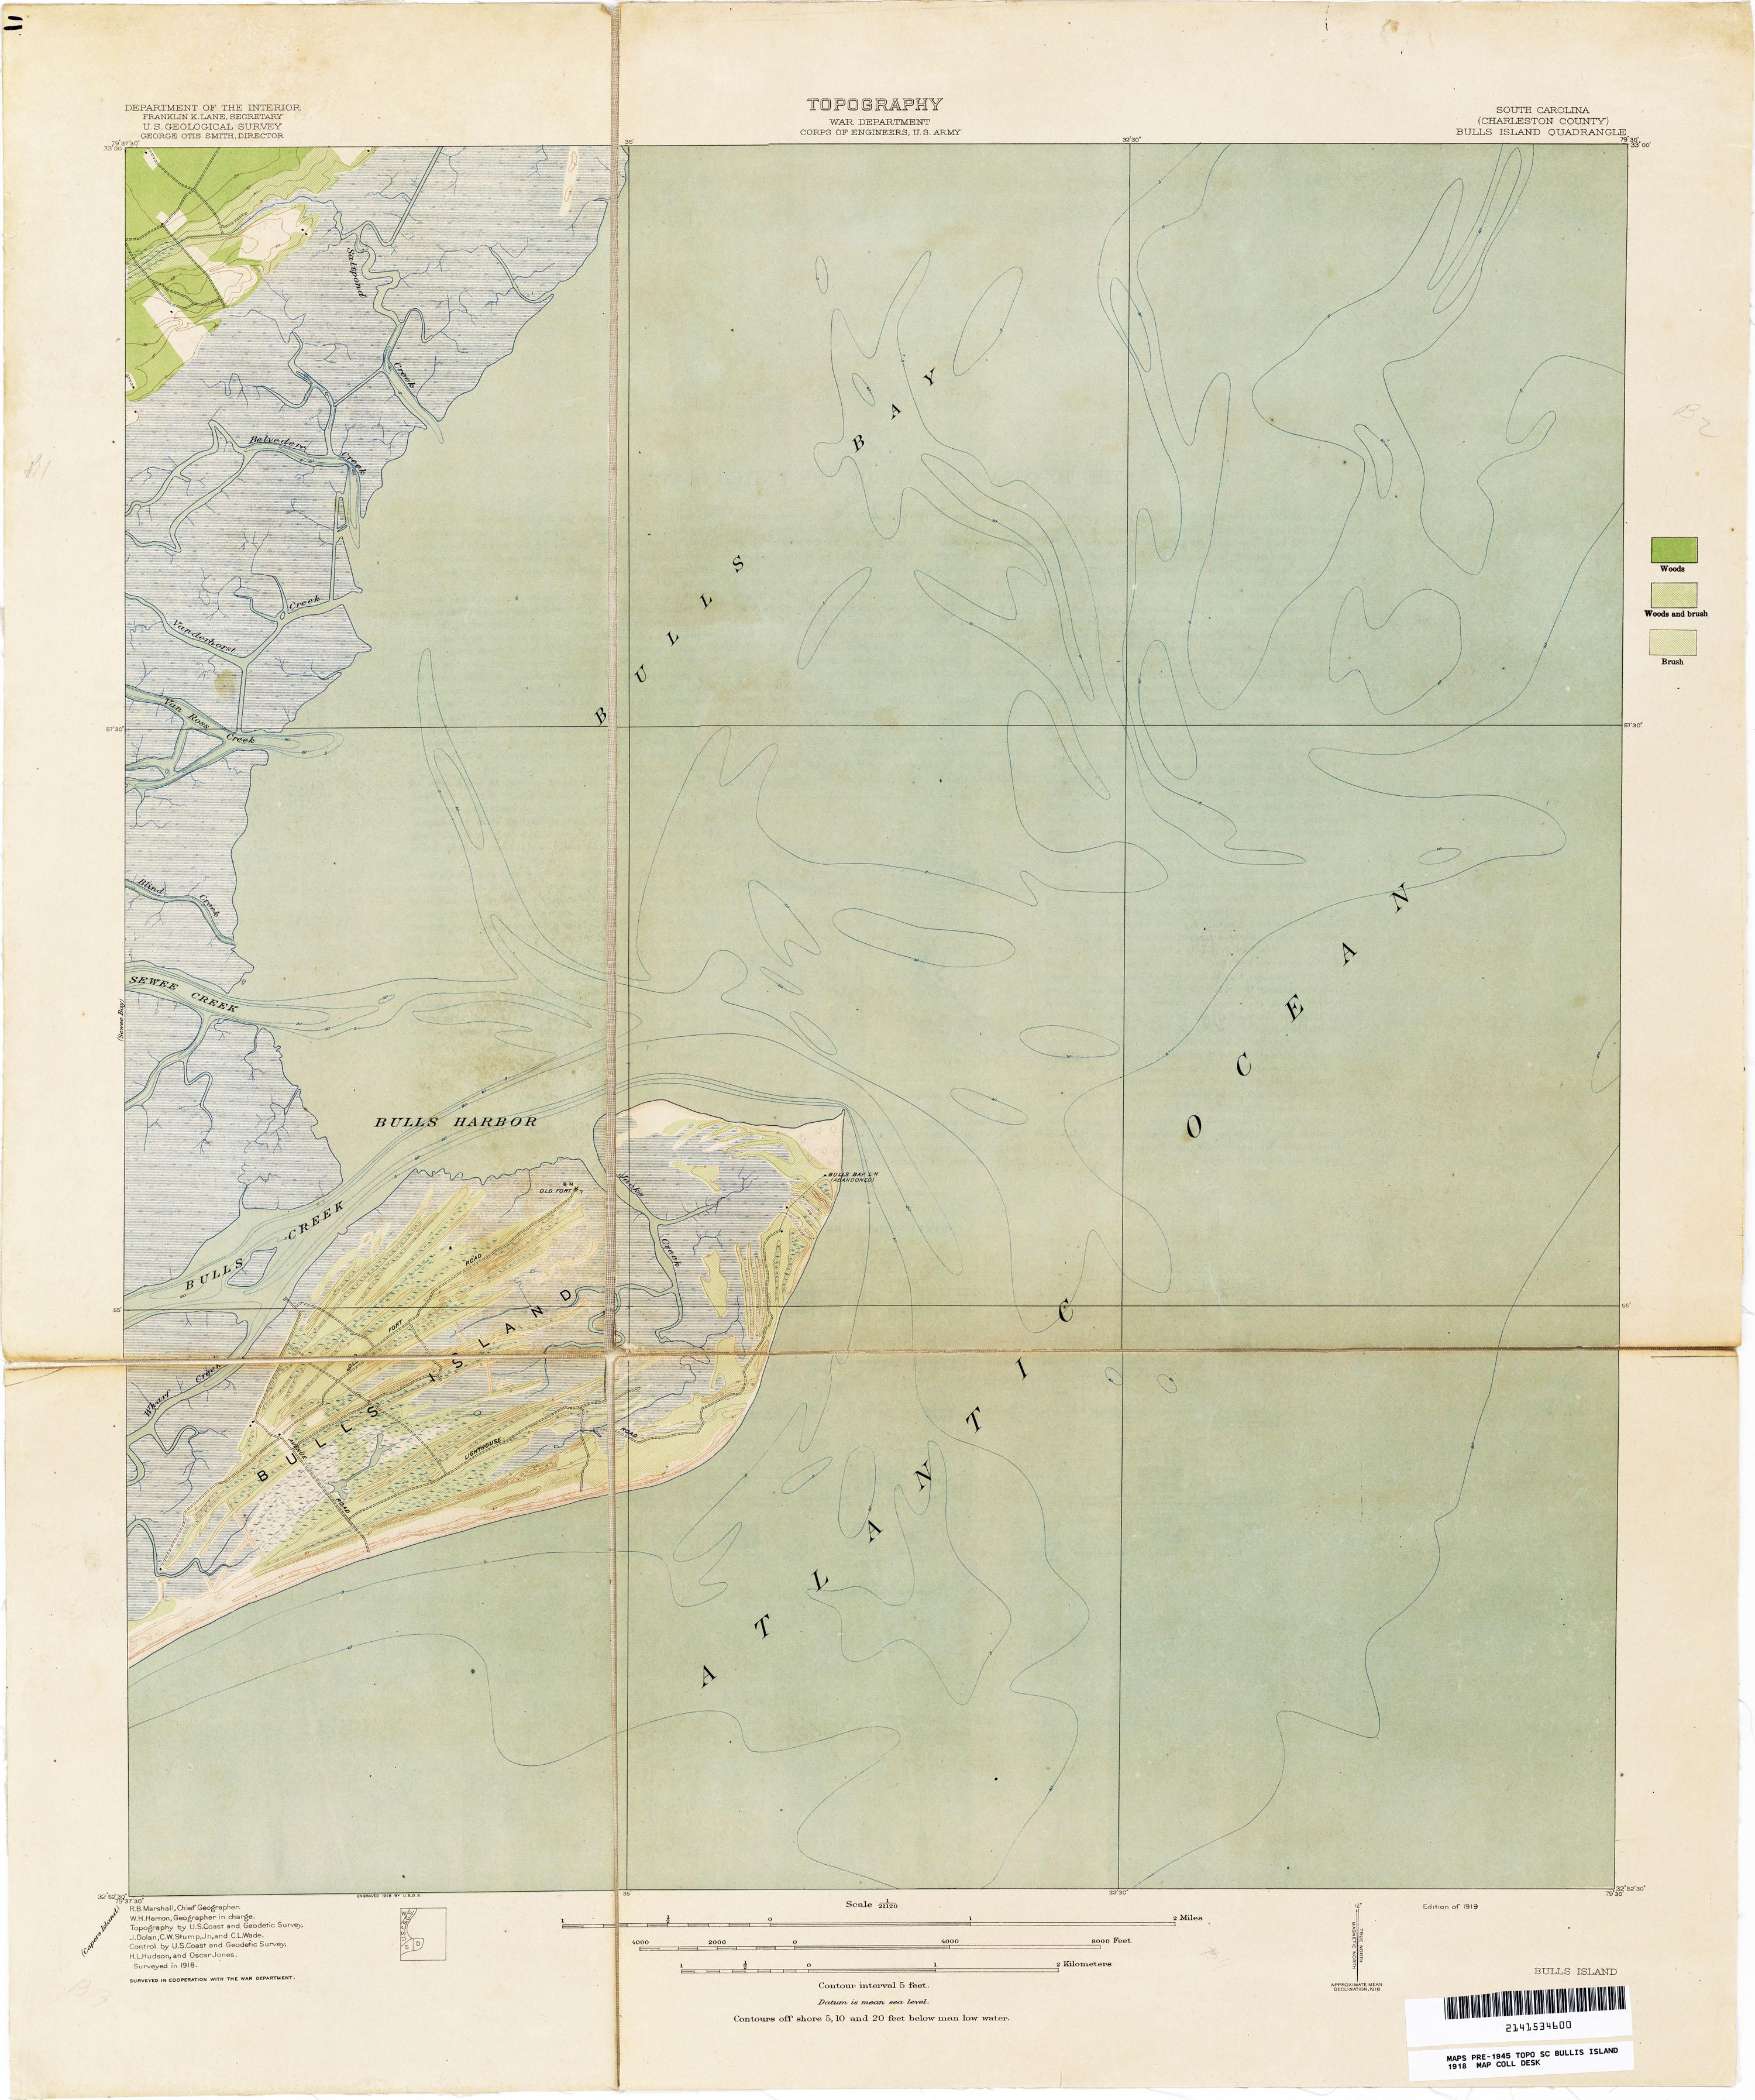 South Carolina Historical Topographic Maps Ho Da Tmx 155 20161009 Honda  Tmx 155 Motorcycle Manual Pdf Displanet Tmx 155 Wiring Diagram